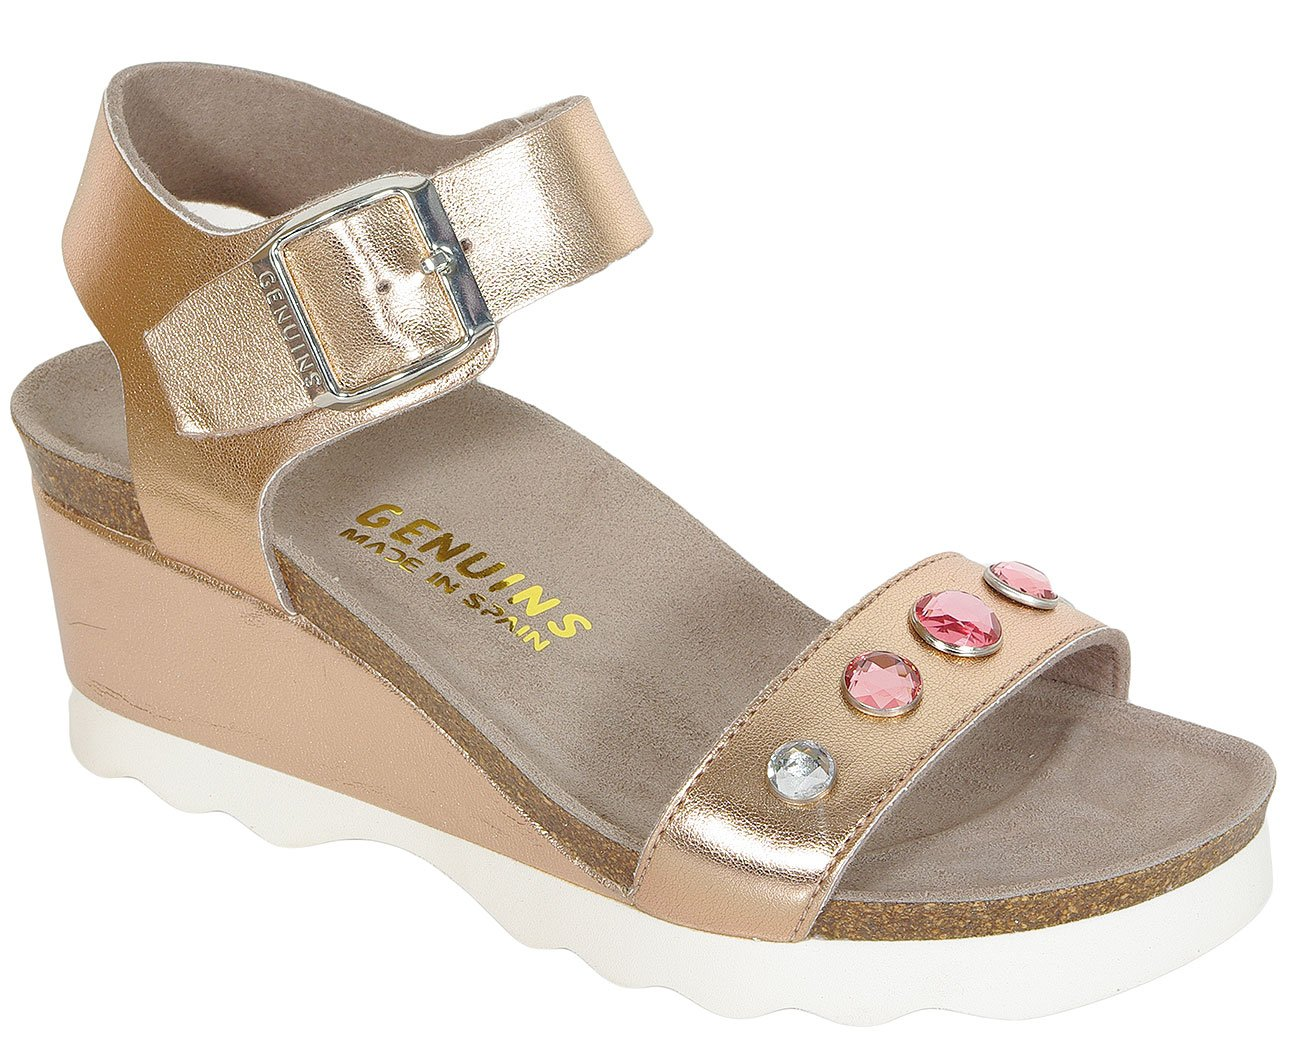 Genuins Columbia Lame Nude sandały